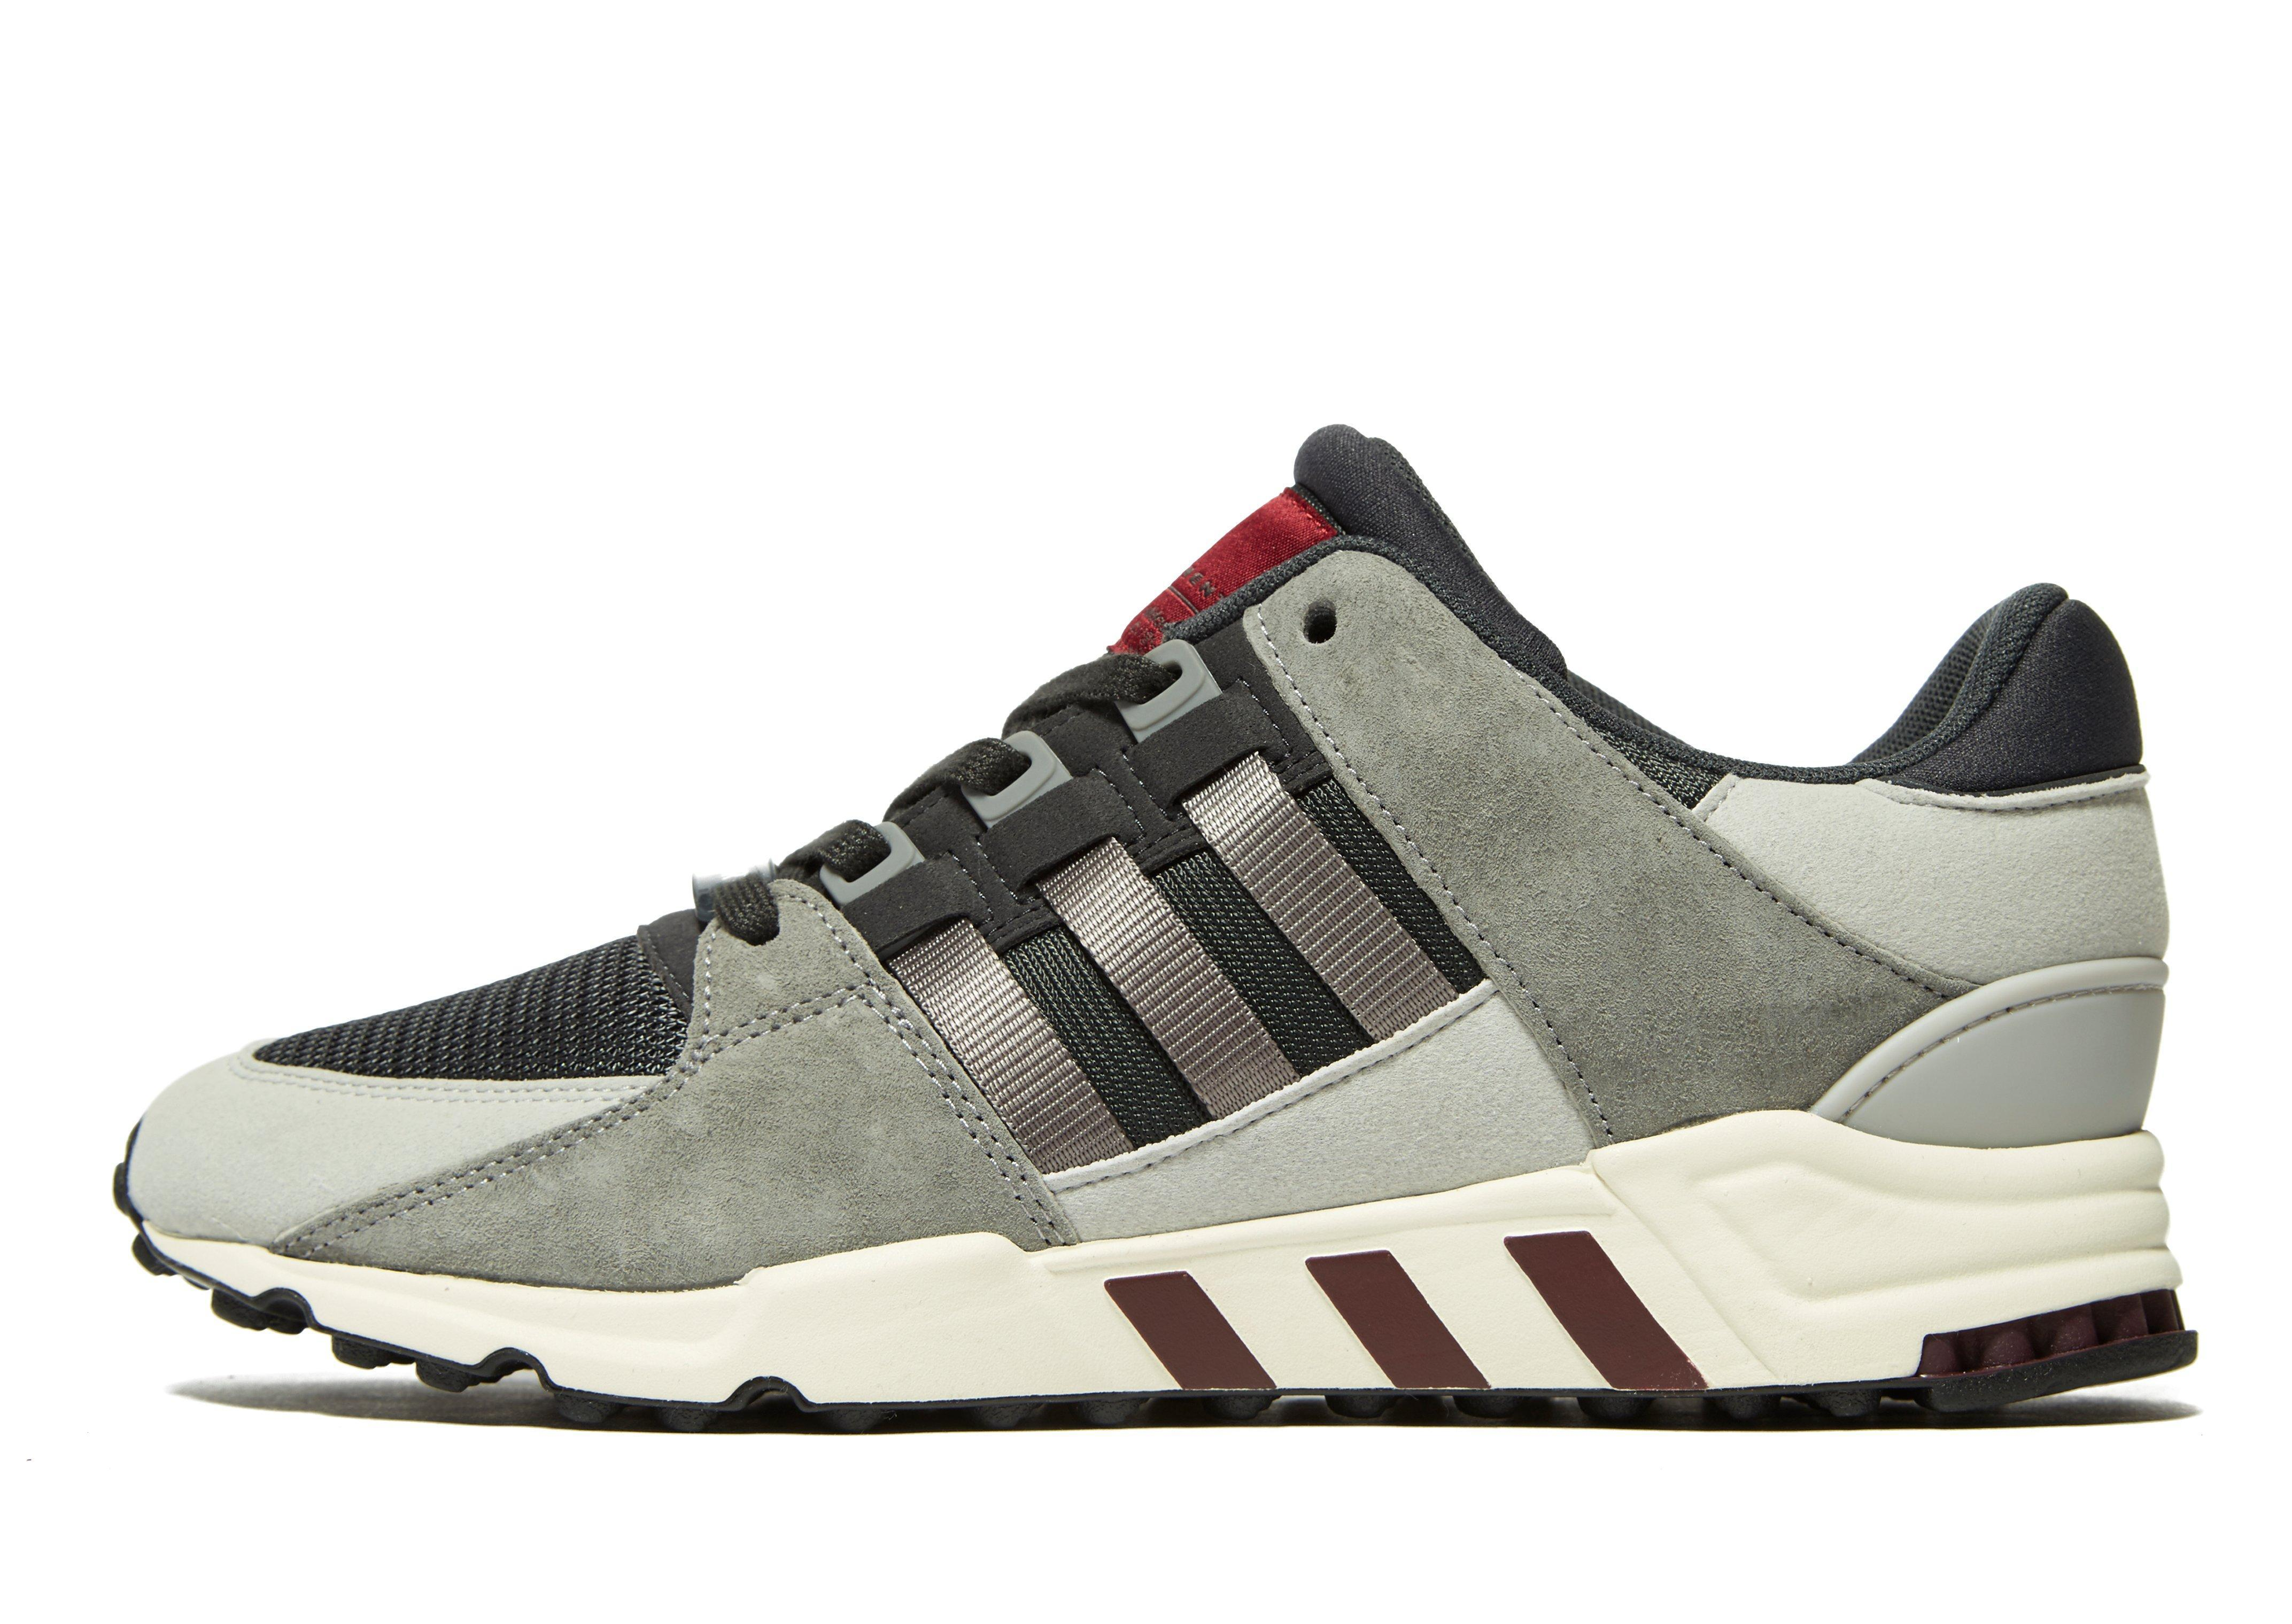 hot sale online 85c58 52c60 Adidas Originals Gray Eqt Running Support Rf for men